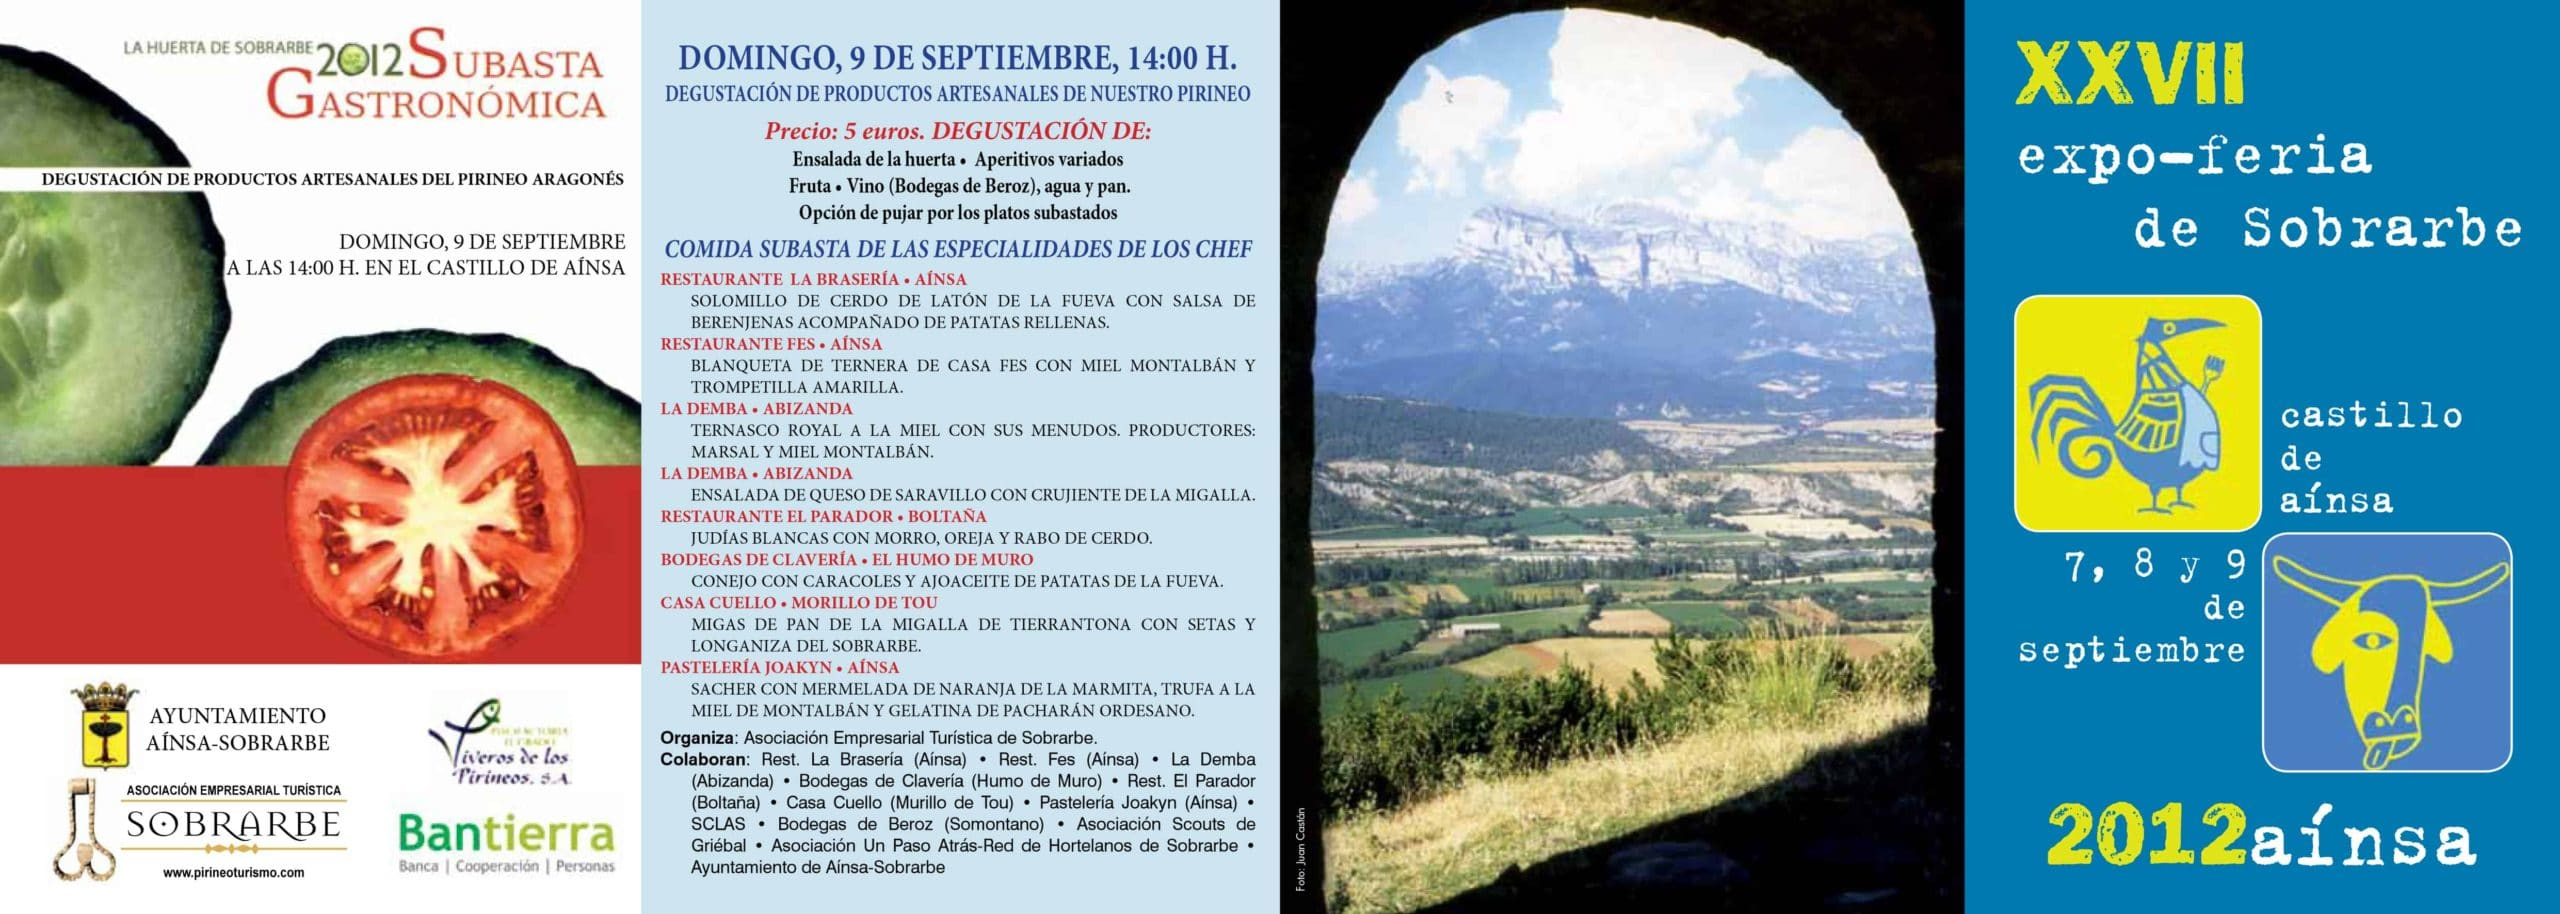 folleto_expoferia_2012-31_copiar.jpg